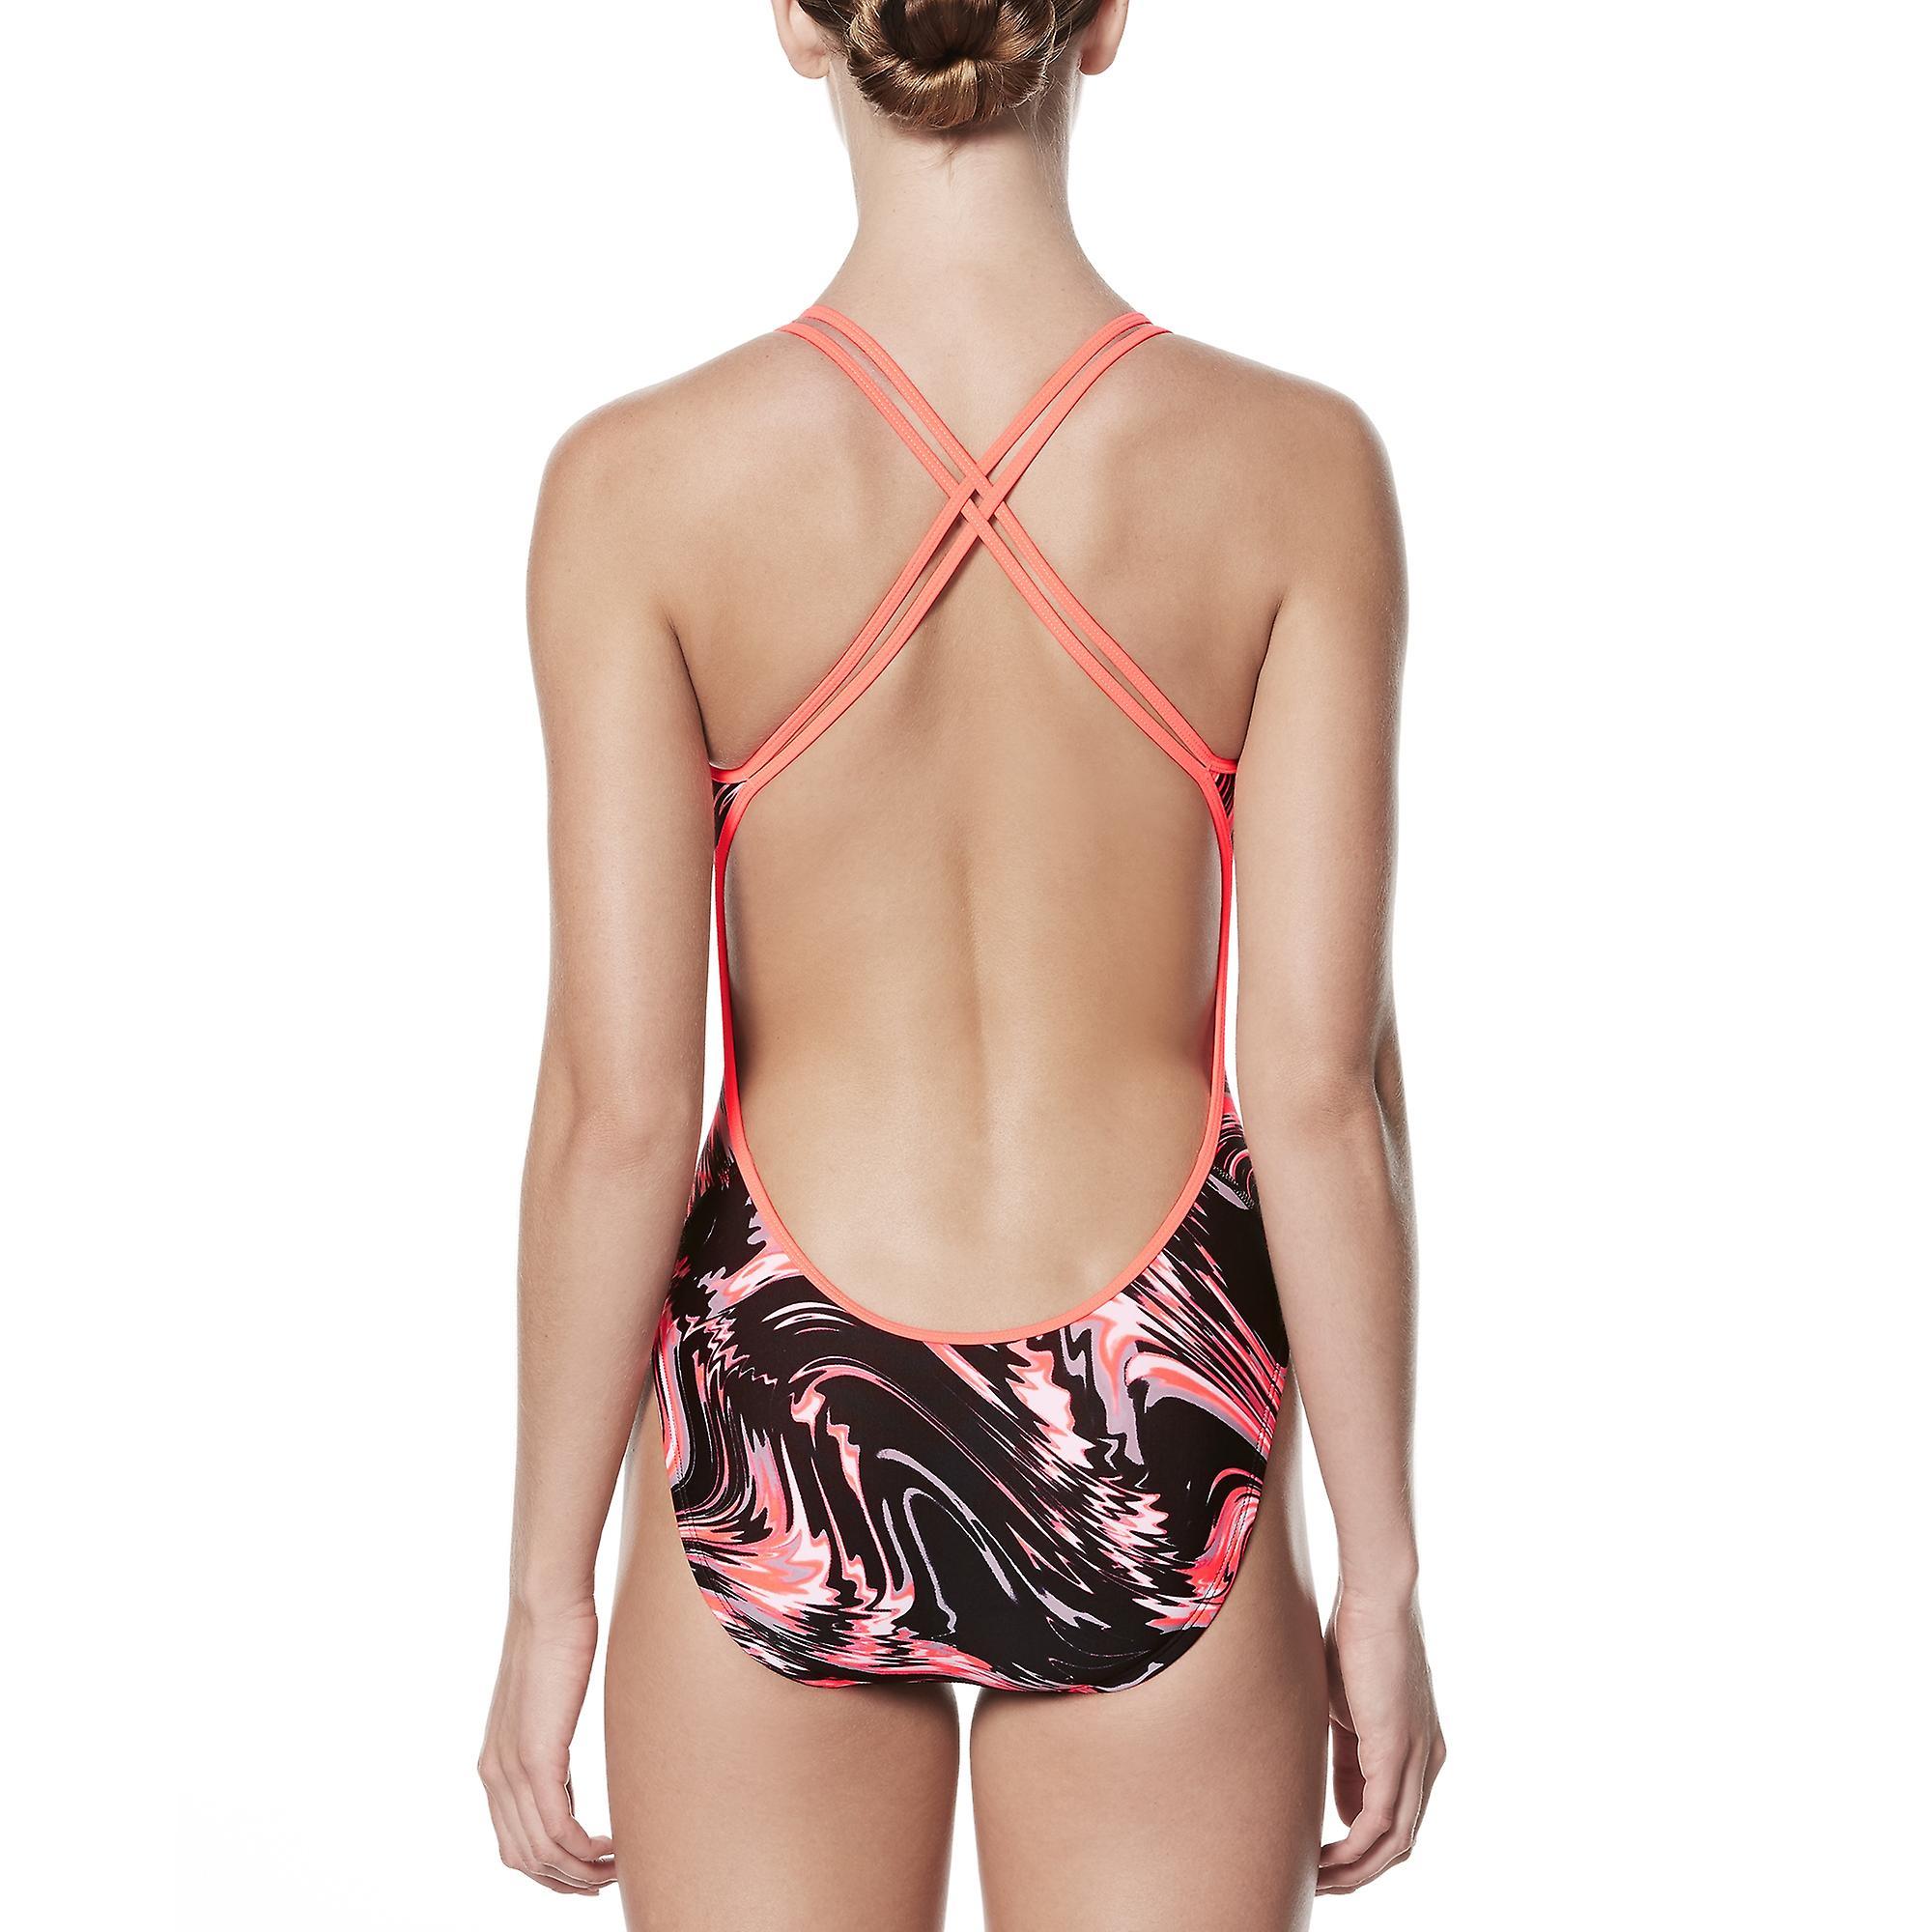 Nike Amp Surge Spiderback One Piece Swimwear For Girls